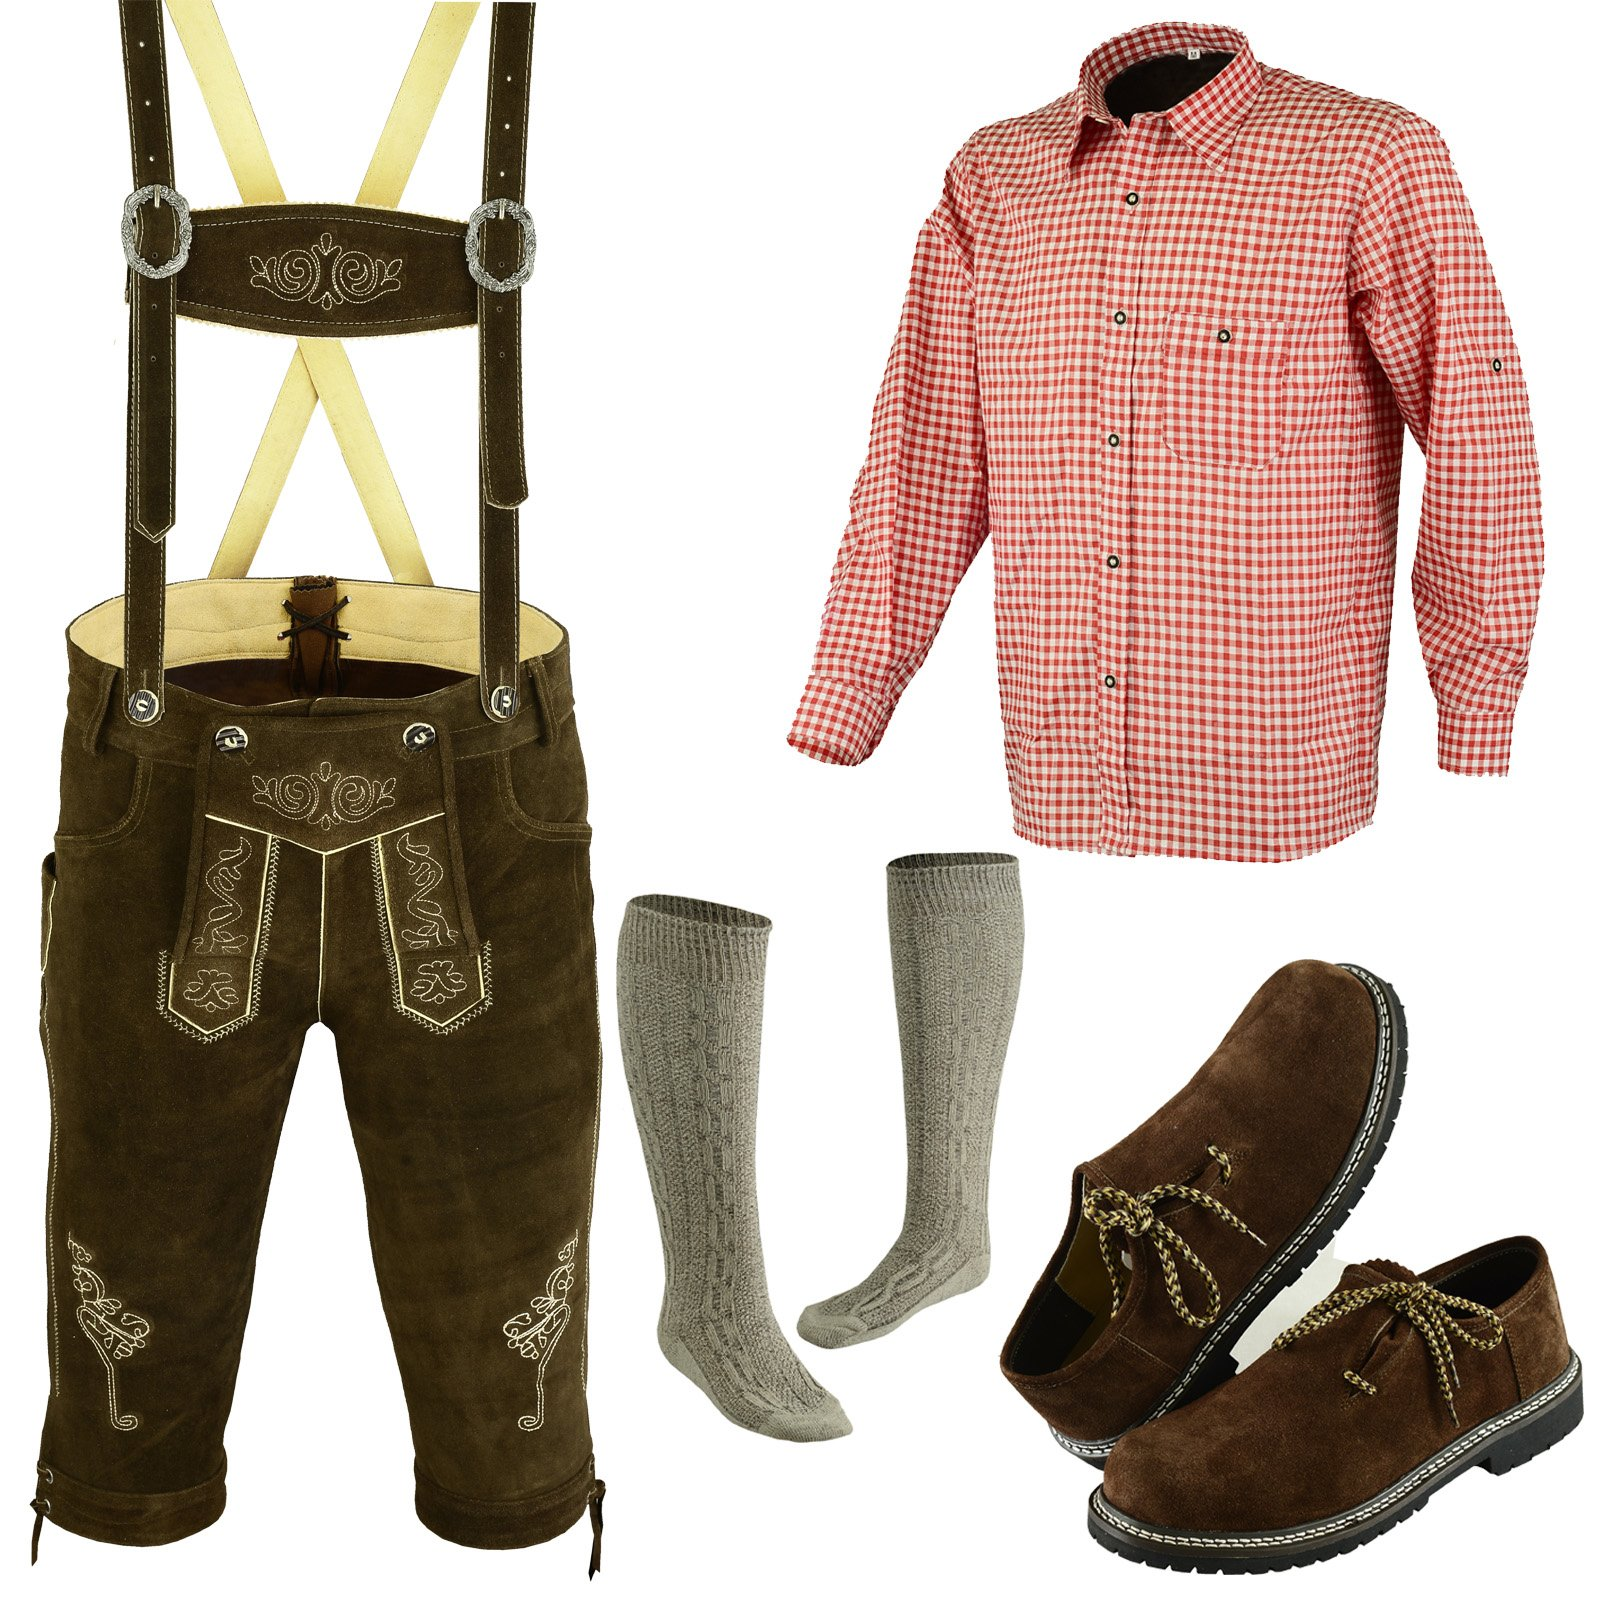 German Bavarian Oktoberfest Trachten Lederhosen Complete Outfit (34)